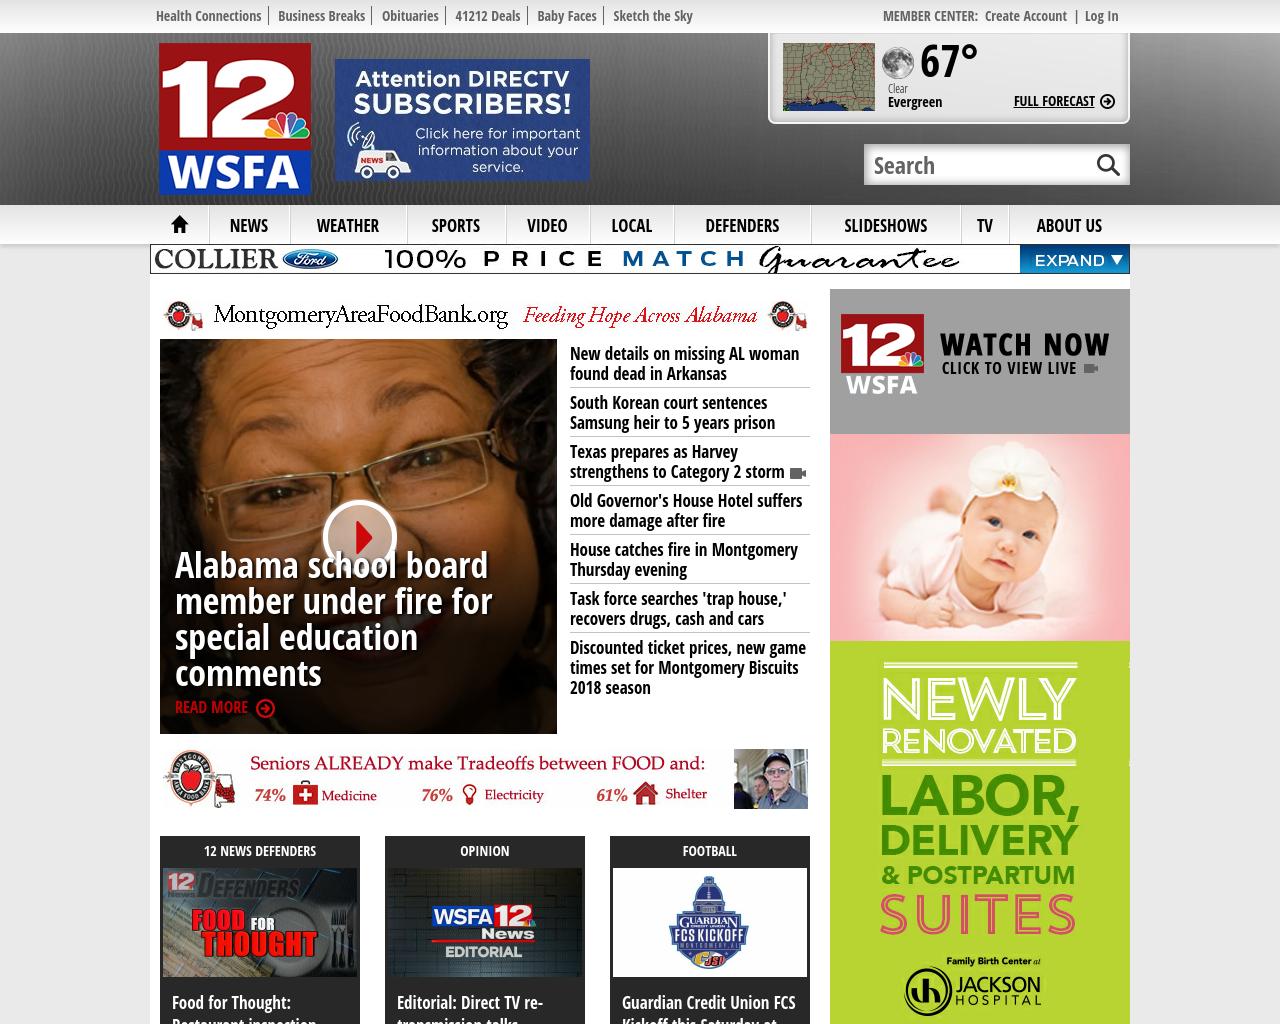 Wsfa Competitors & Alternatives (Ads) in 2019